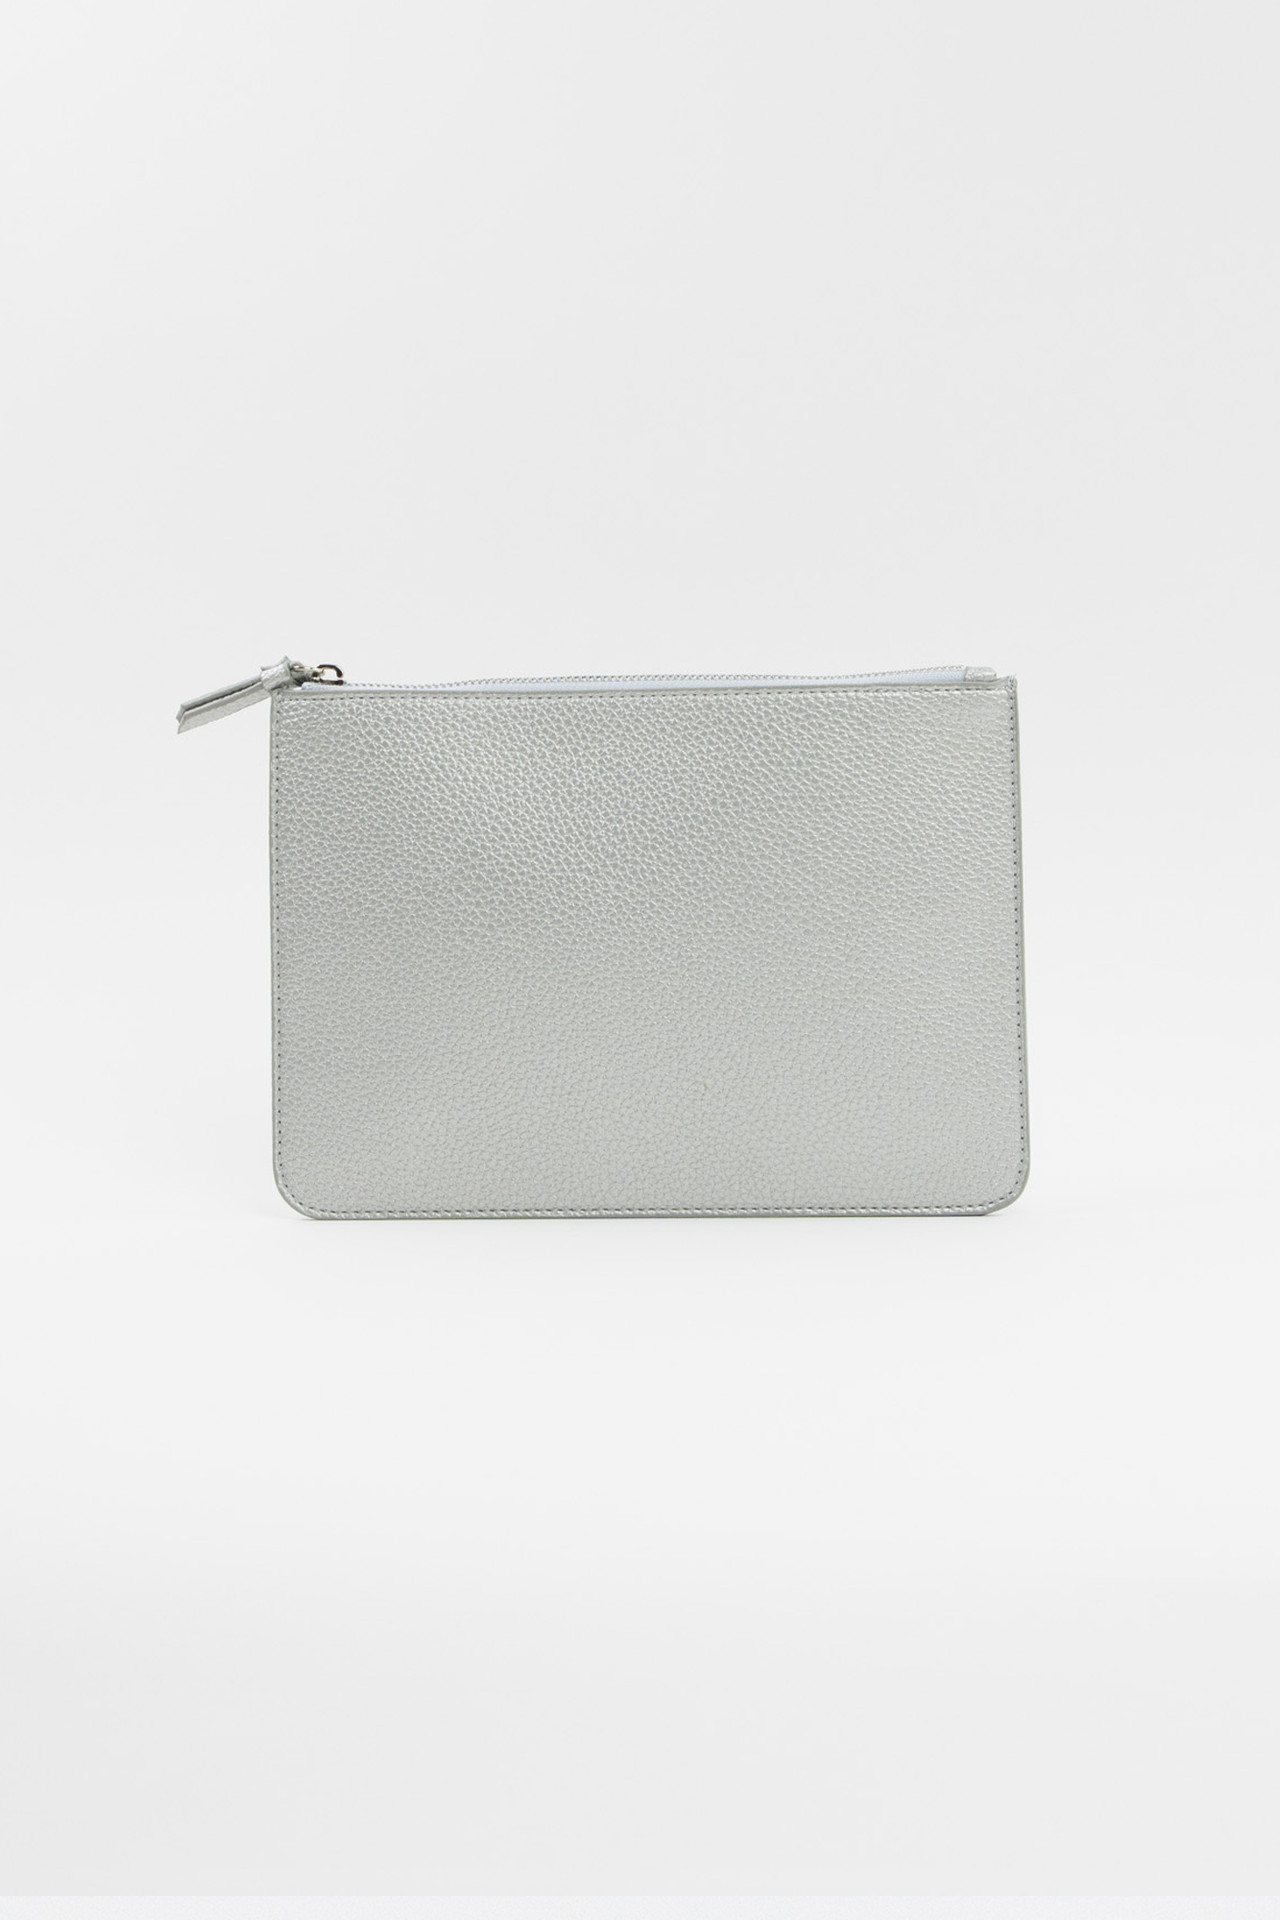 Vegan Leather Clutch - Silver